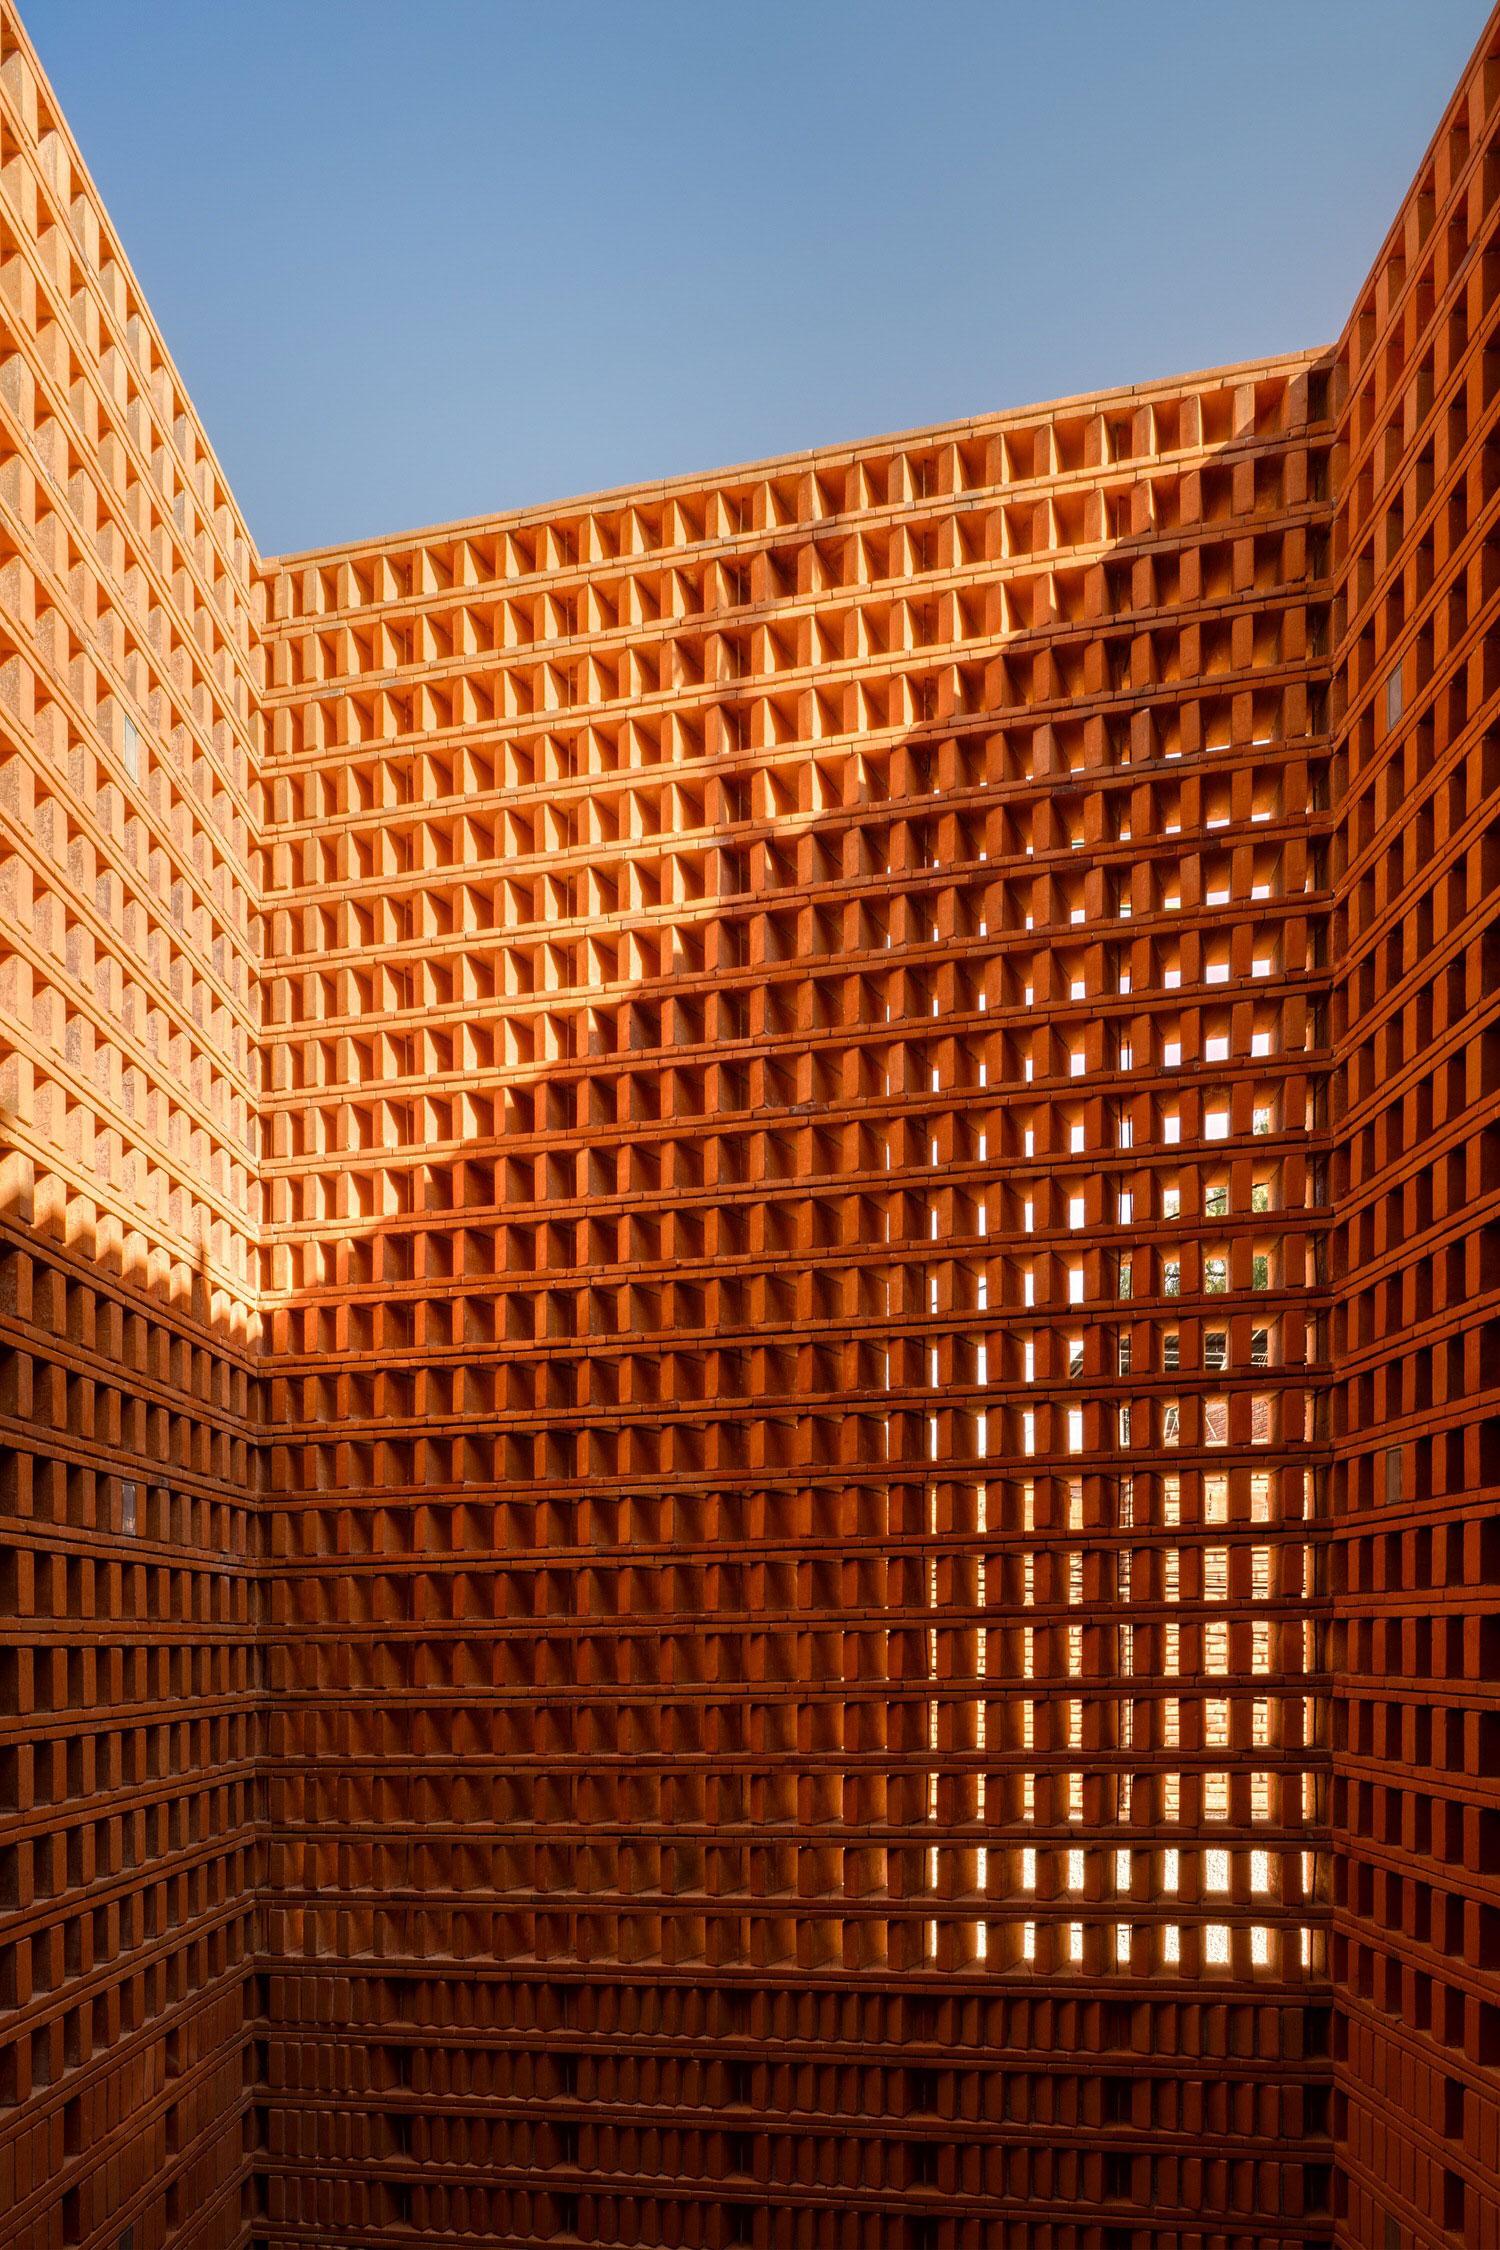 Iturbide Studio Mexico City Brick Architecture Taller Mauricio Rocha Gabriela Carrillo Yellowtrace 03